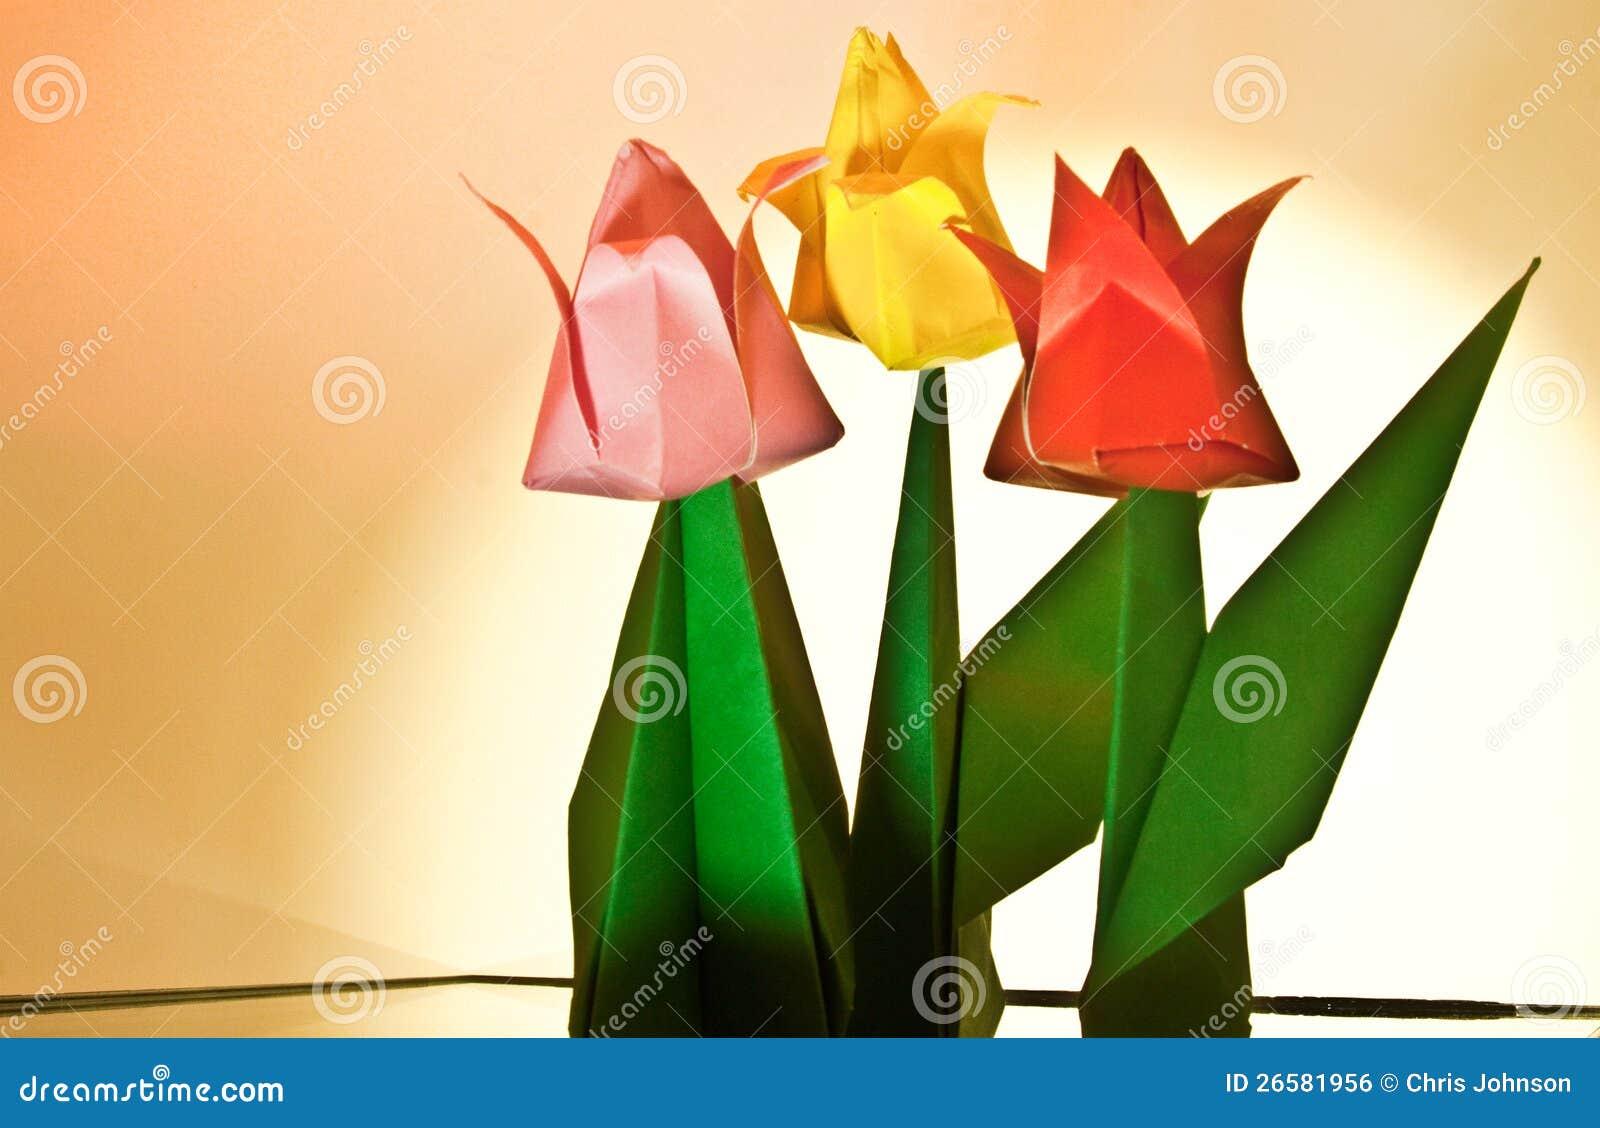 Tulip Flower Craft Stock Photo Image Of Children Arts 26581956